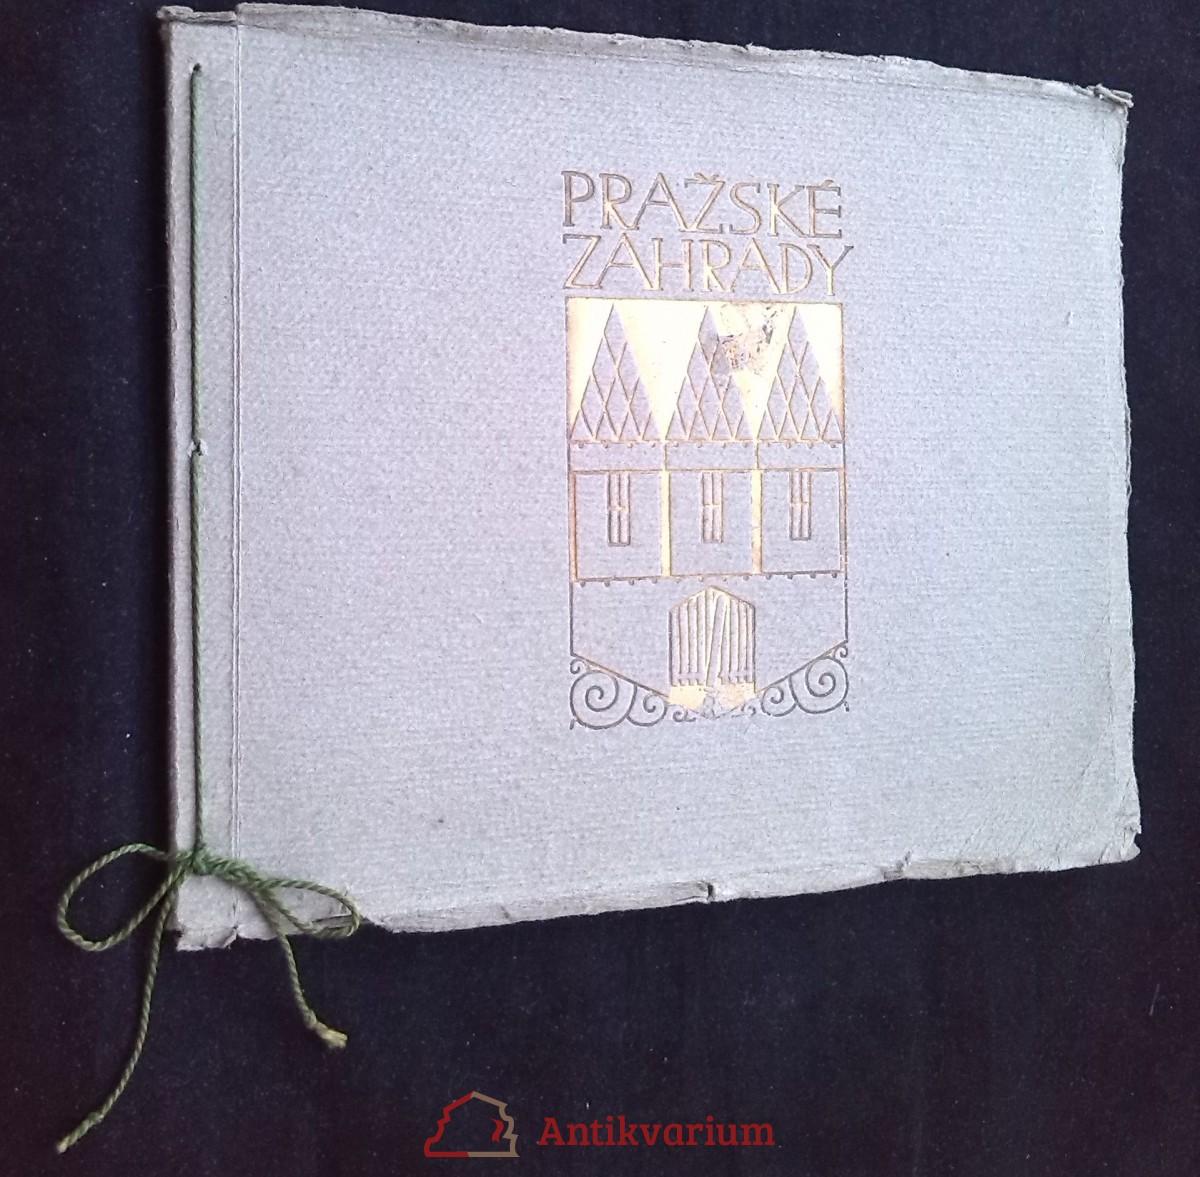 antikvární kniha Pražské zahrady, 1913